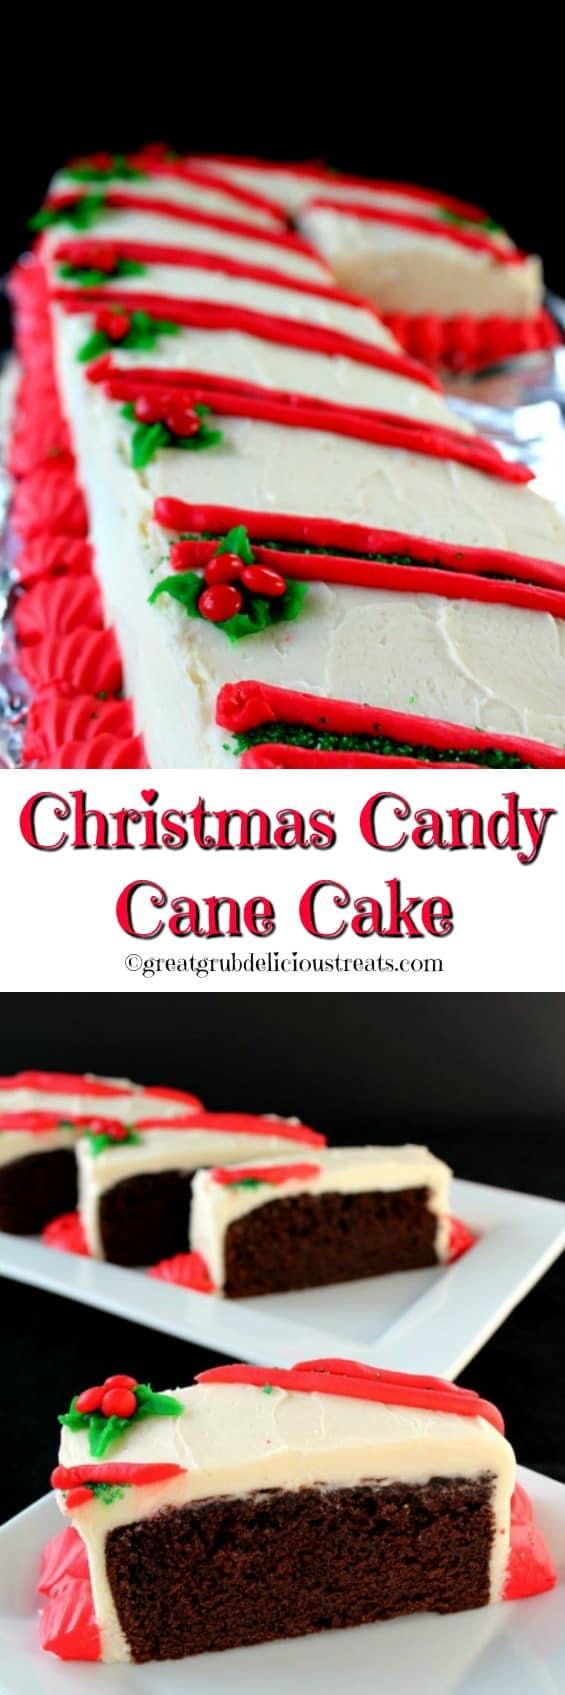 Christmas Candy Cane Cake